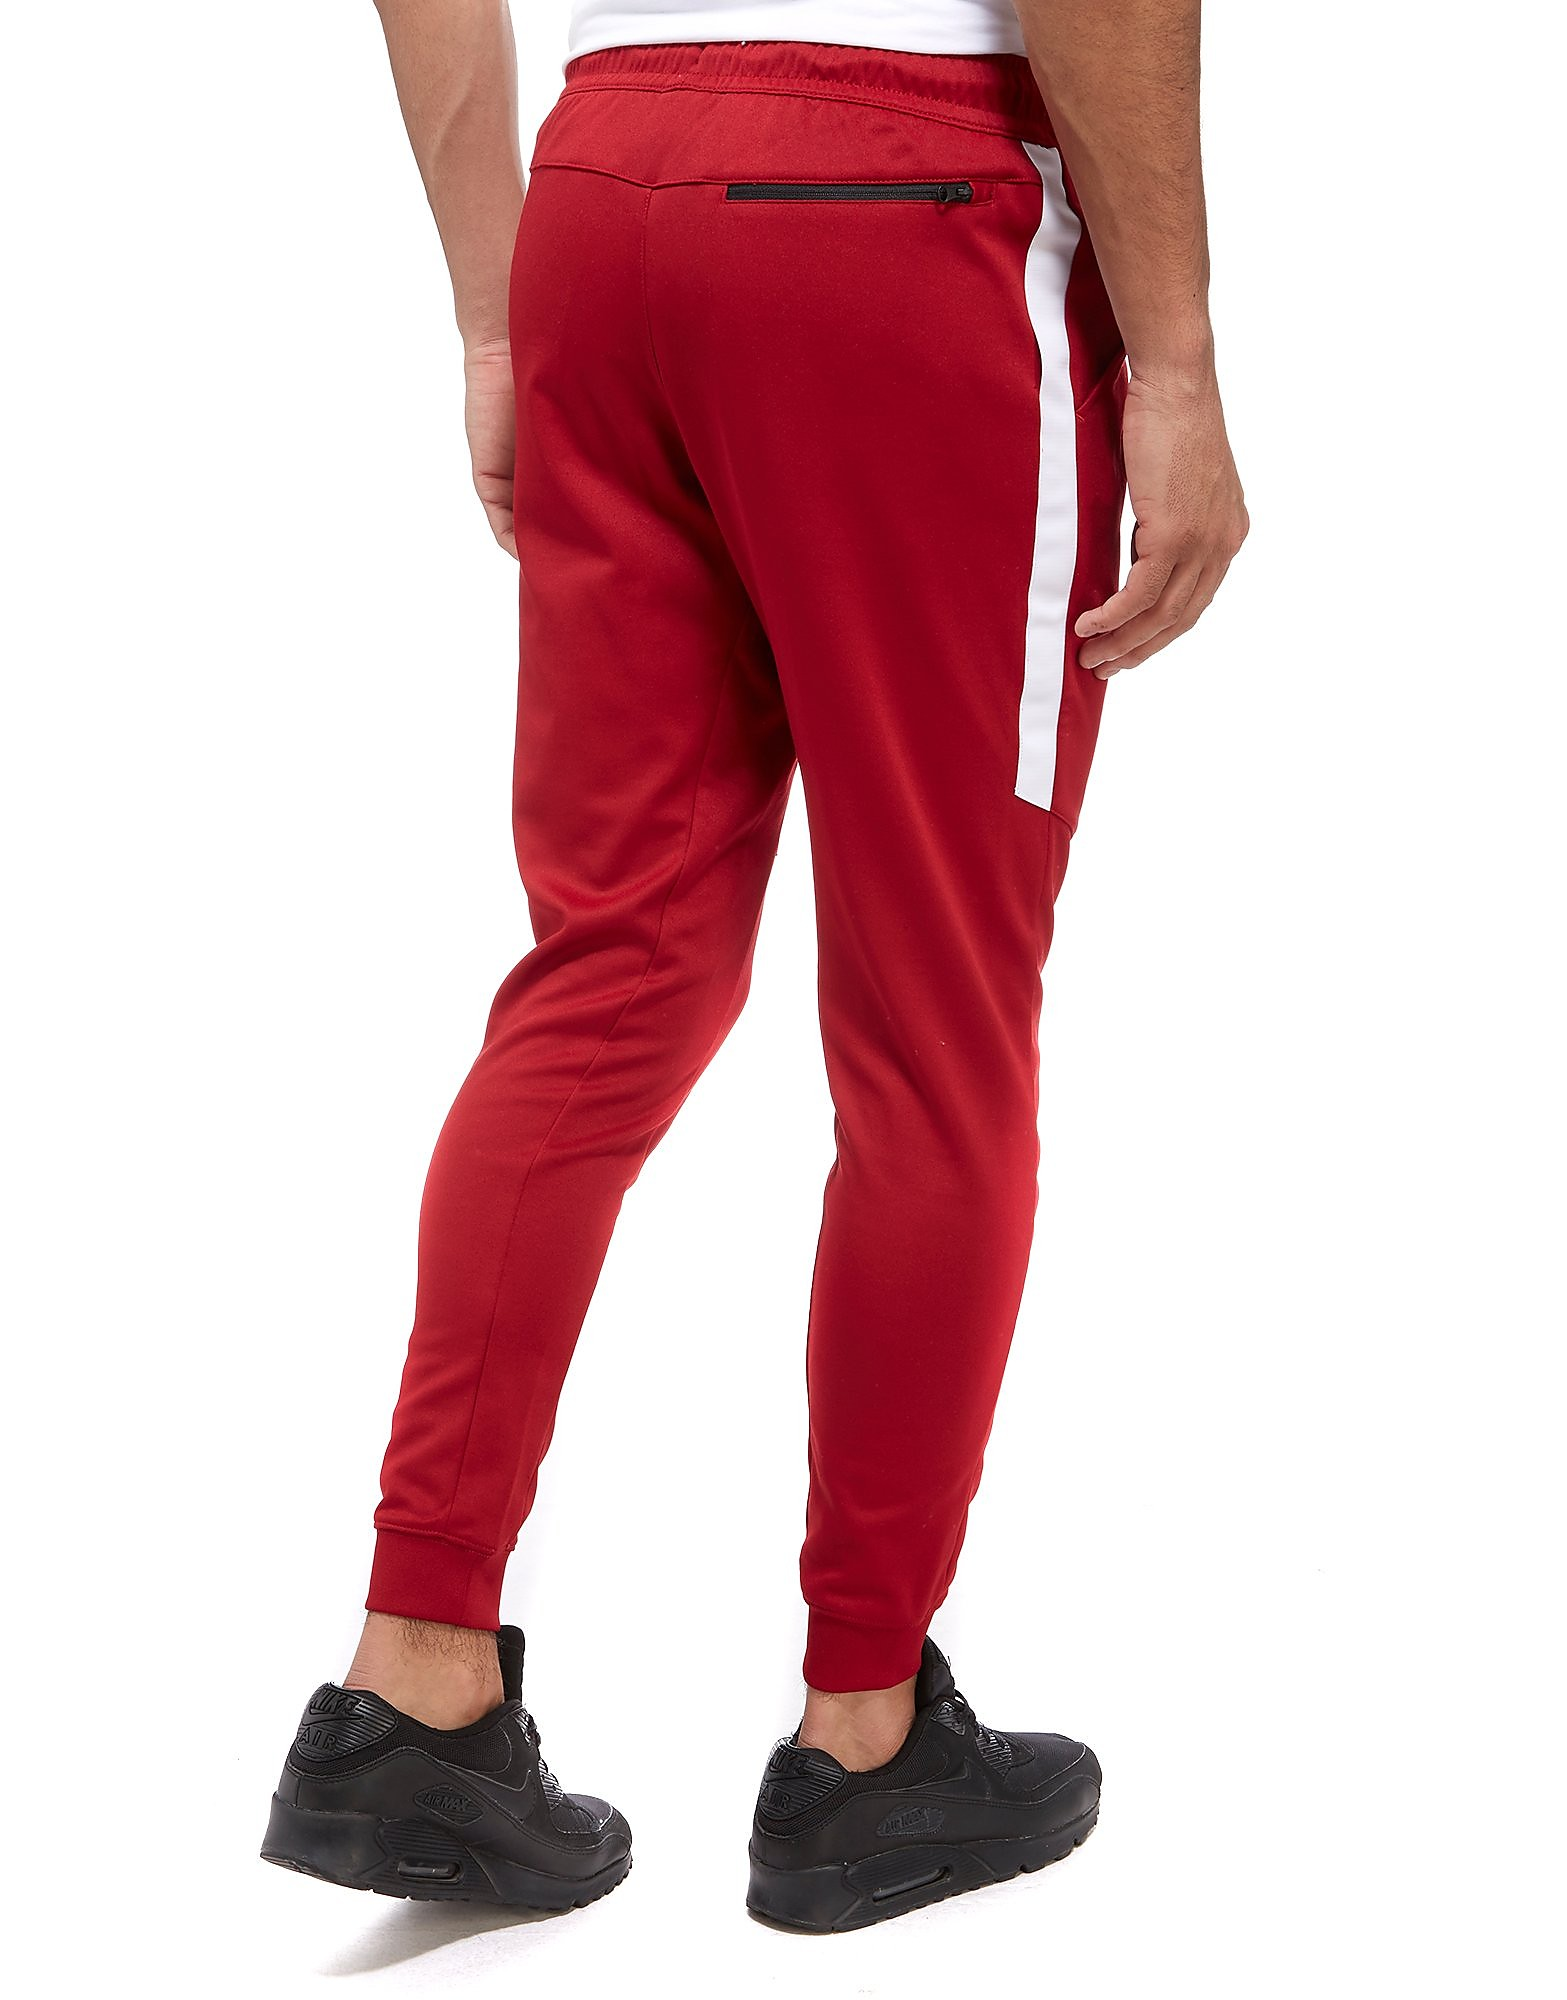 Nike pantalón de chándal Tribute